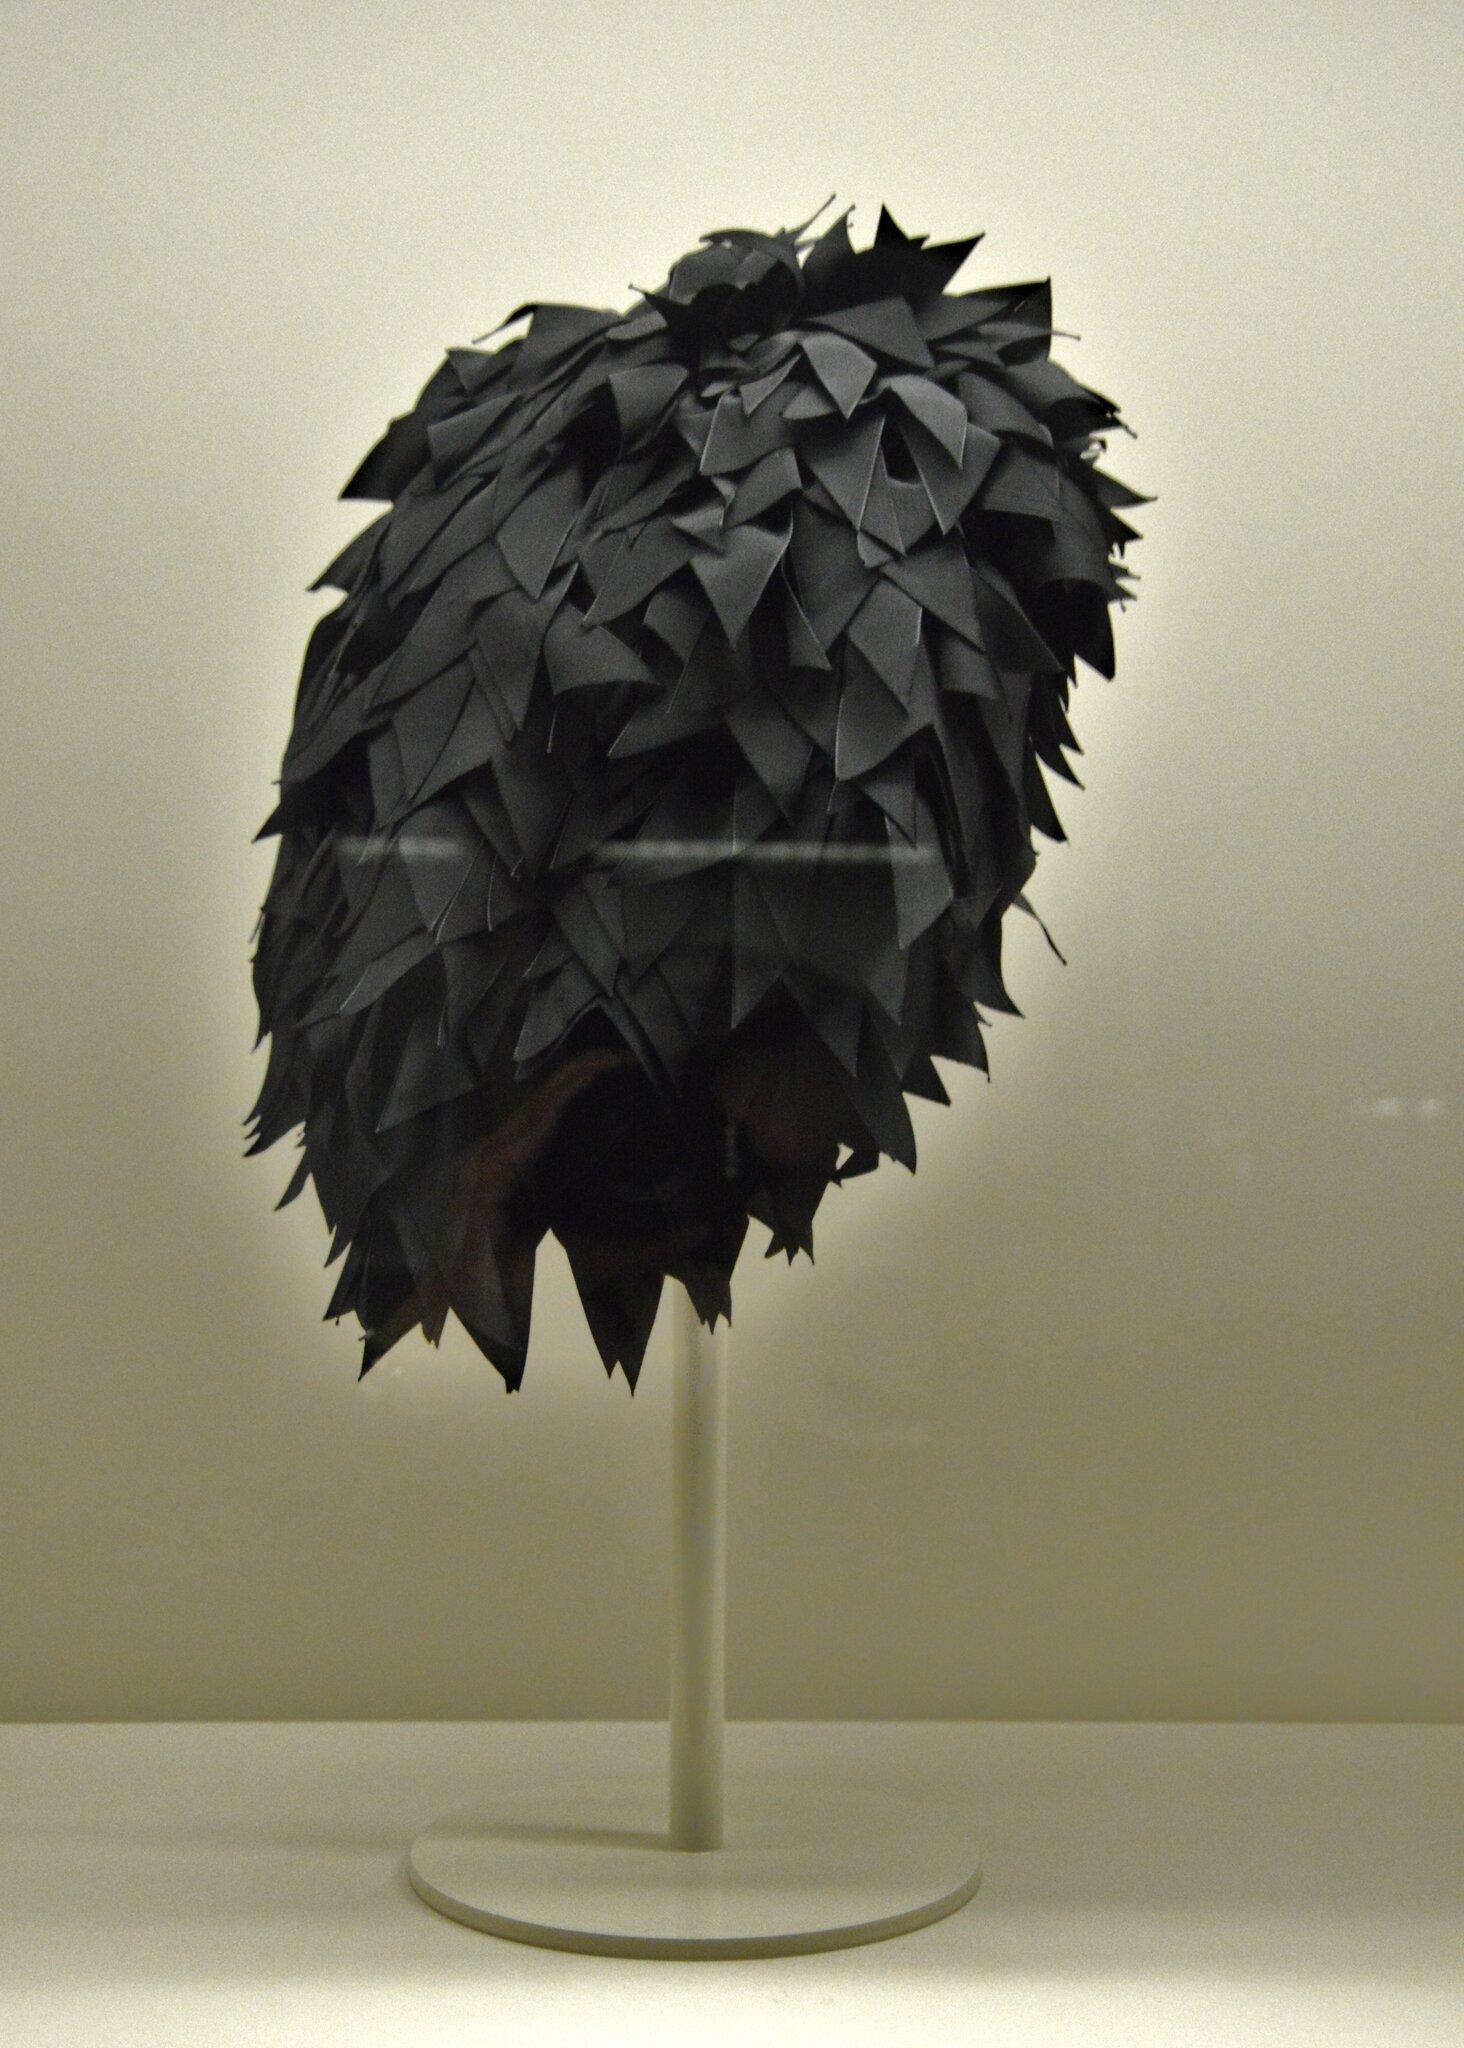 Evening cap trimmed with black ribbons, Cristòbal Balenciaga, 1955